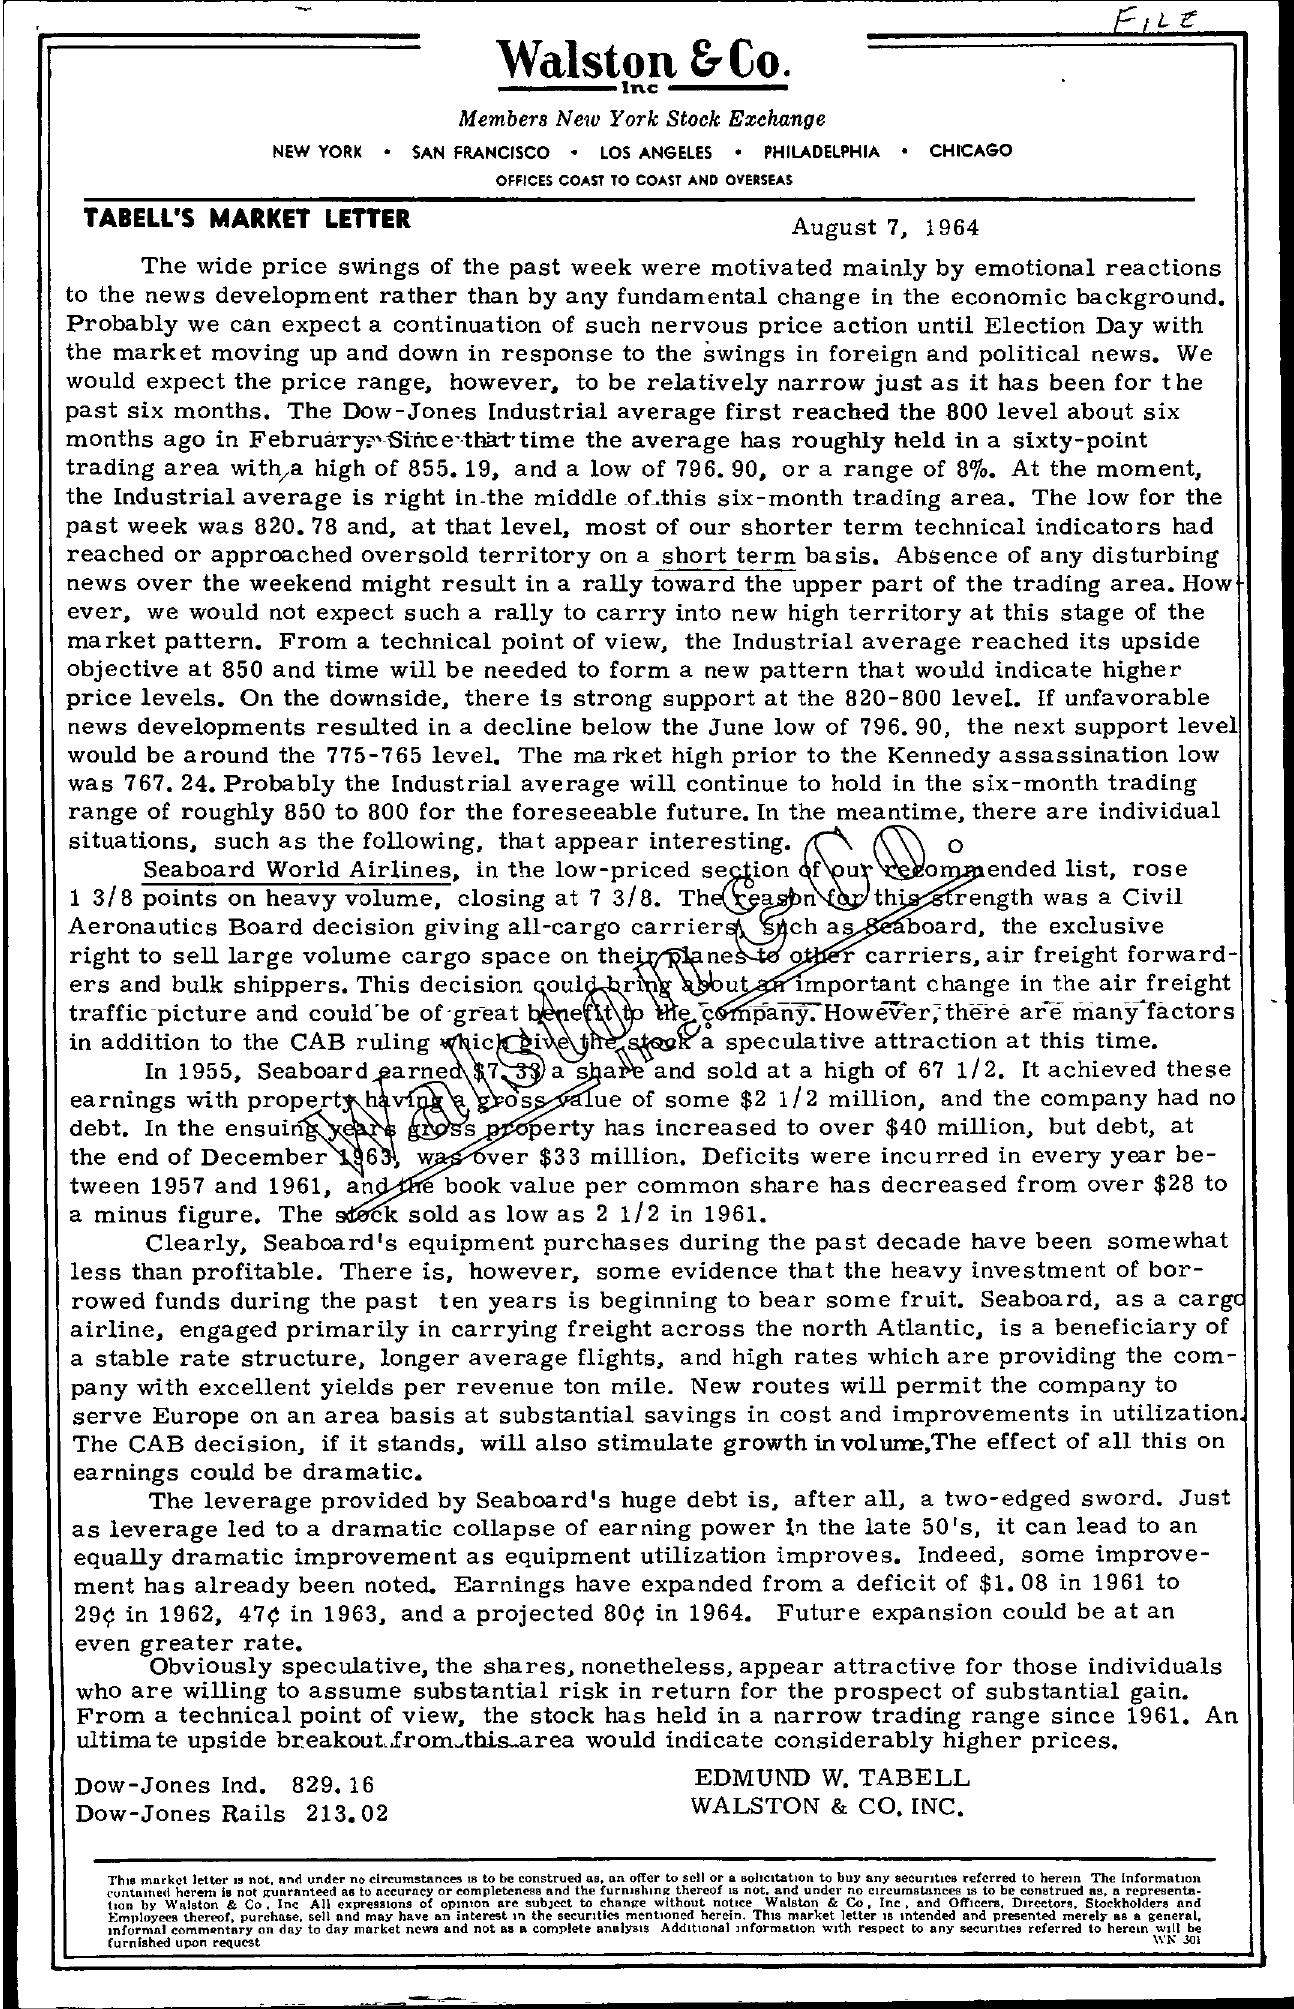 Tabell's Market Letter - August 07, 1964